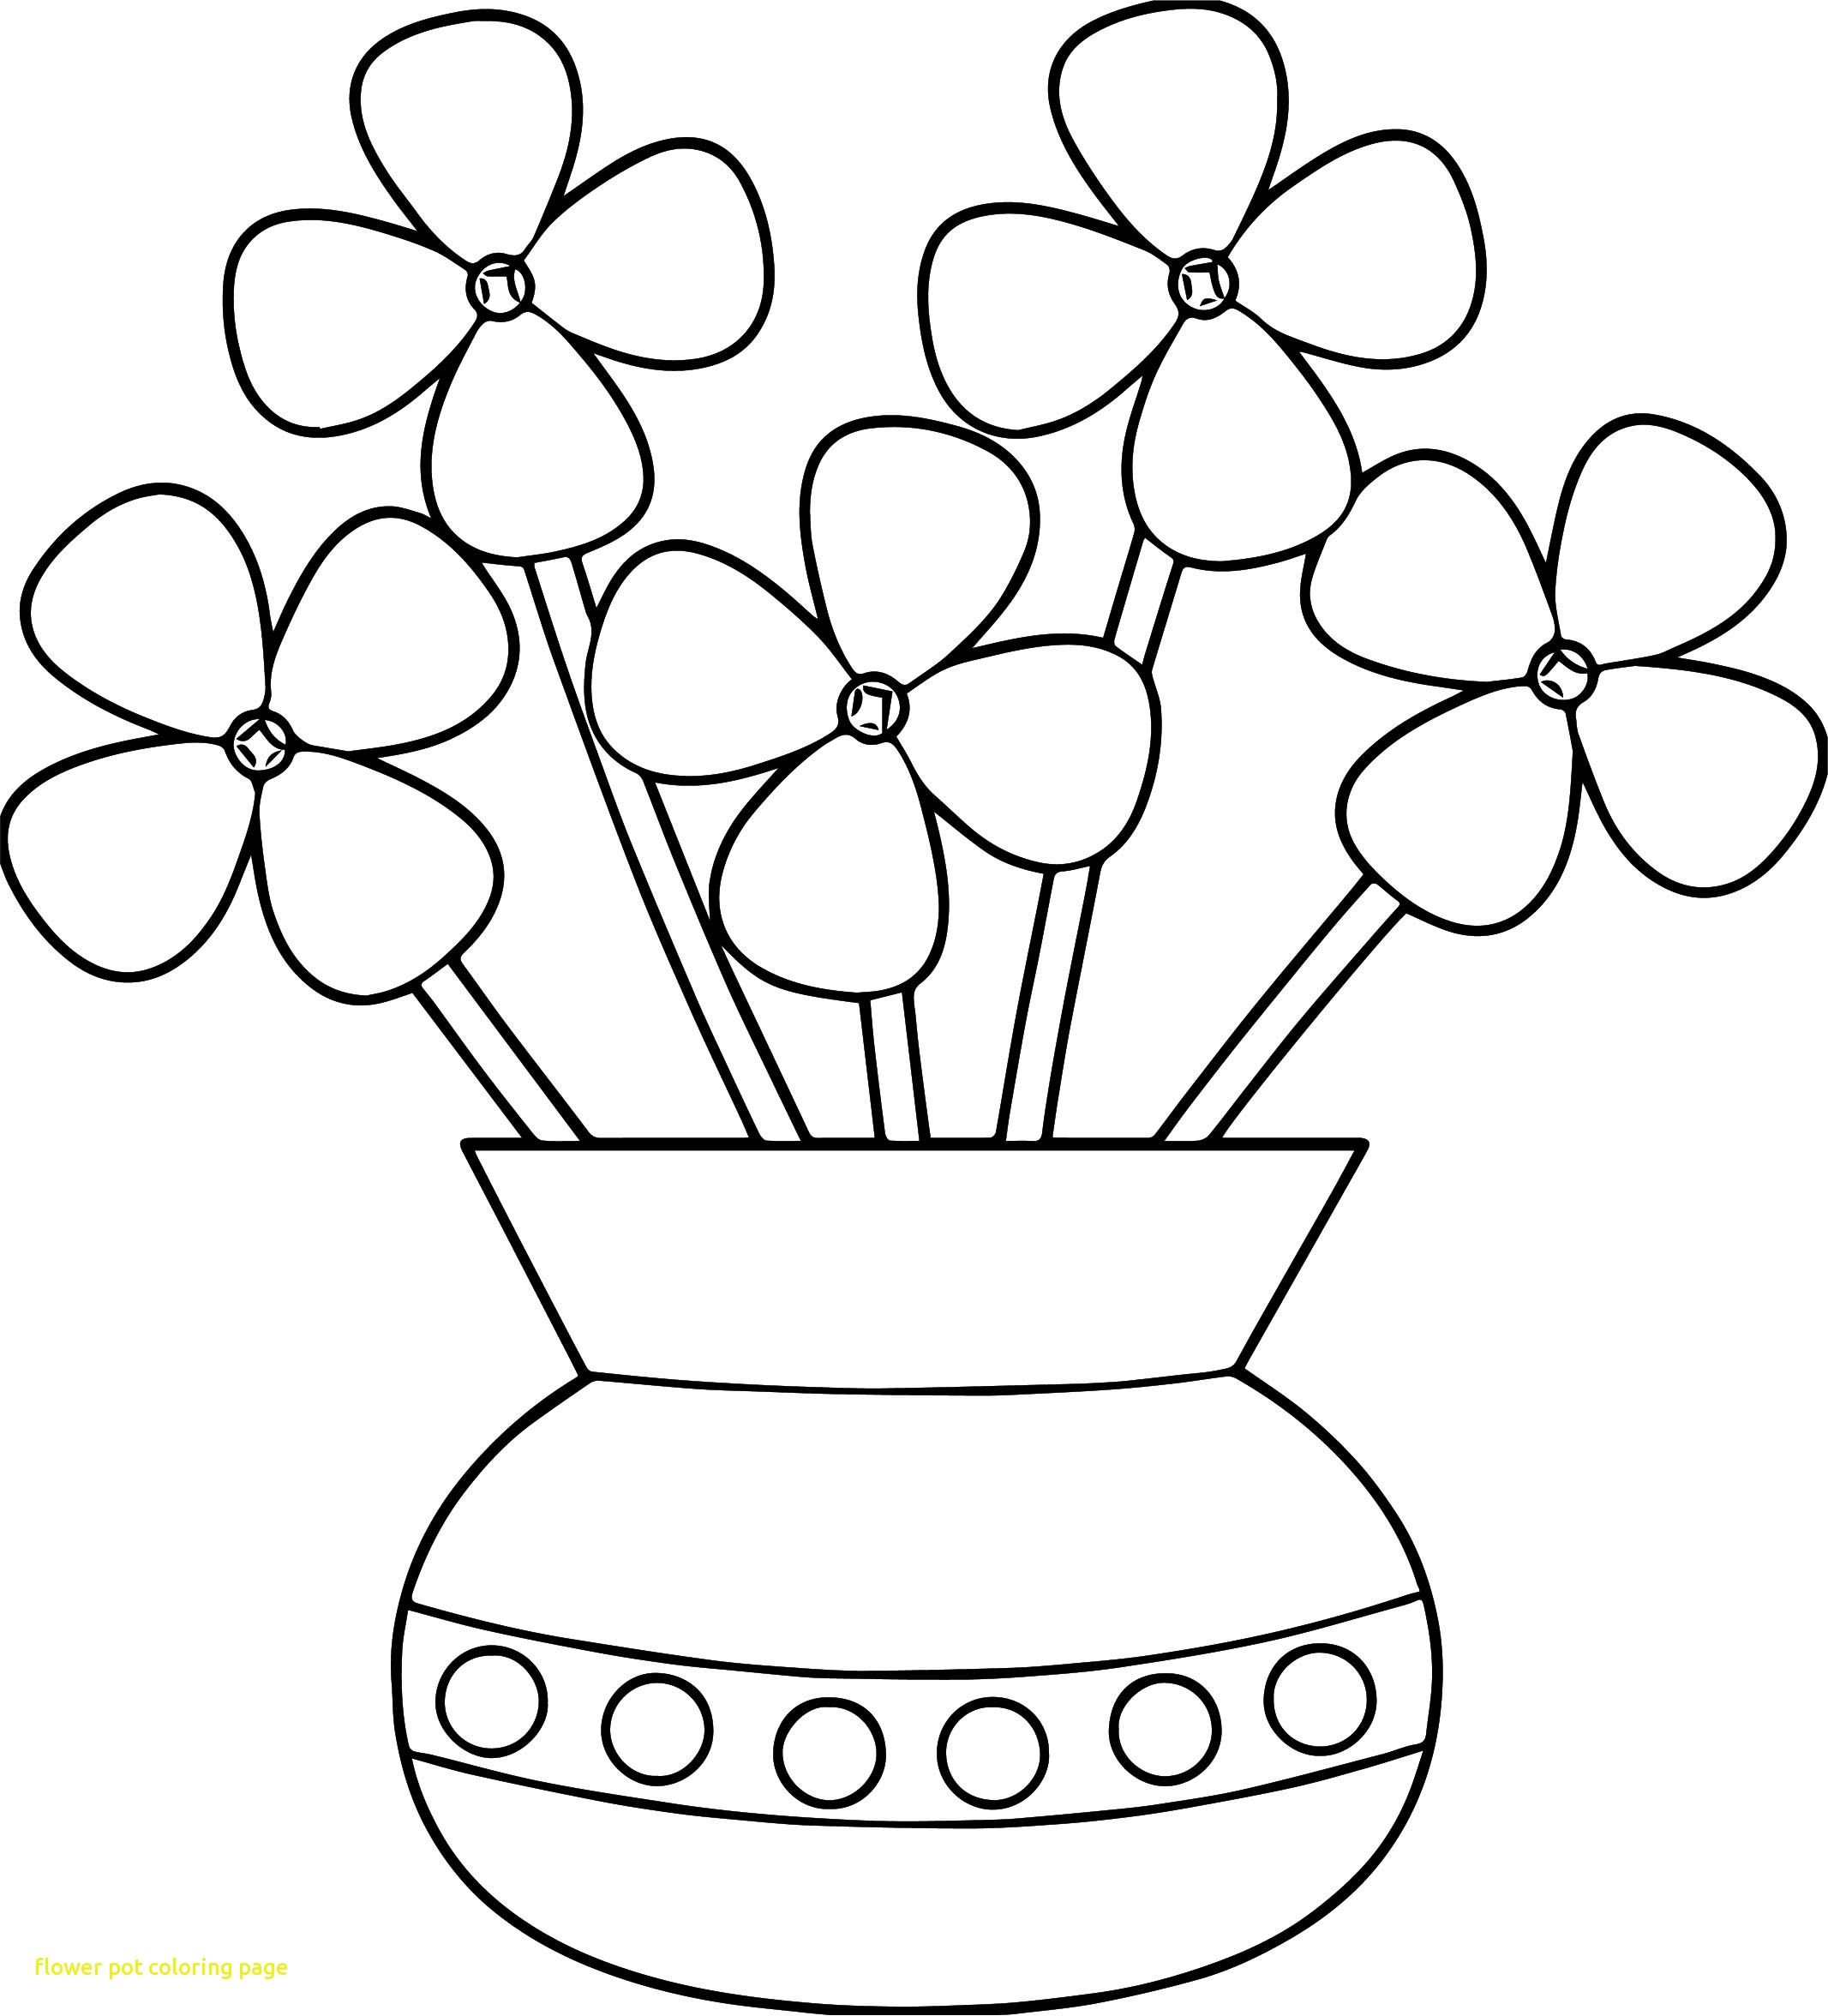 Flower Pot Coloring Page   Colorme Rocks   Flower Coloring